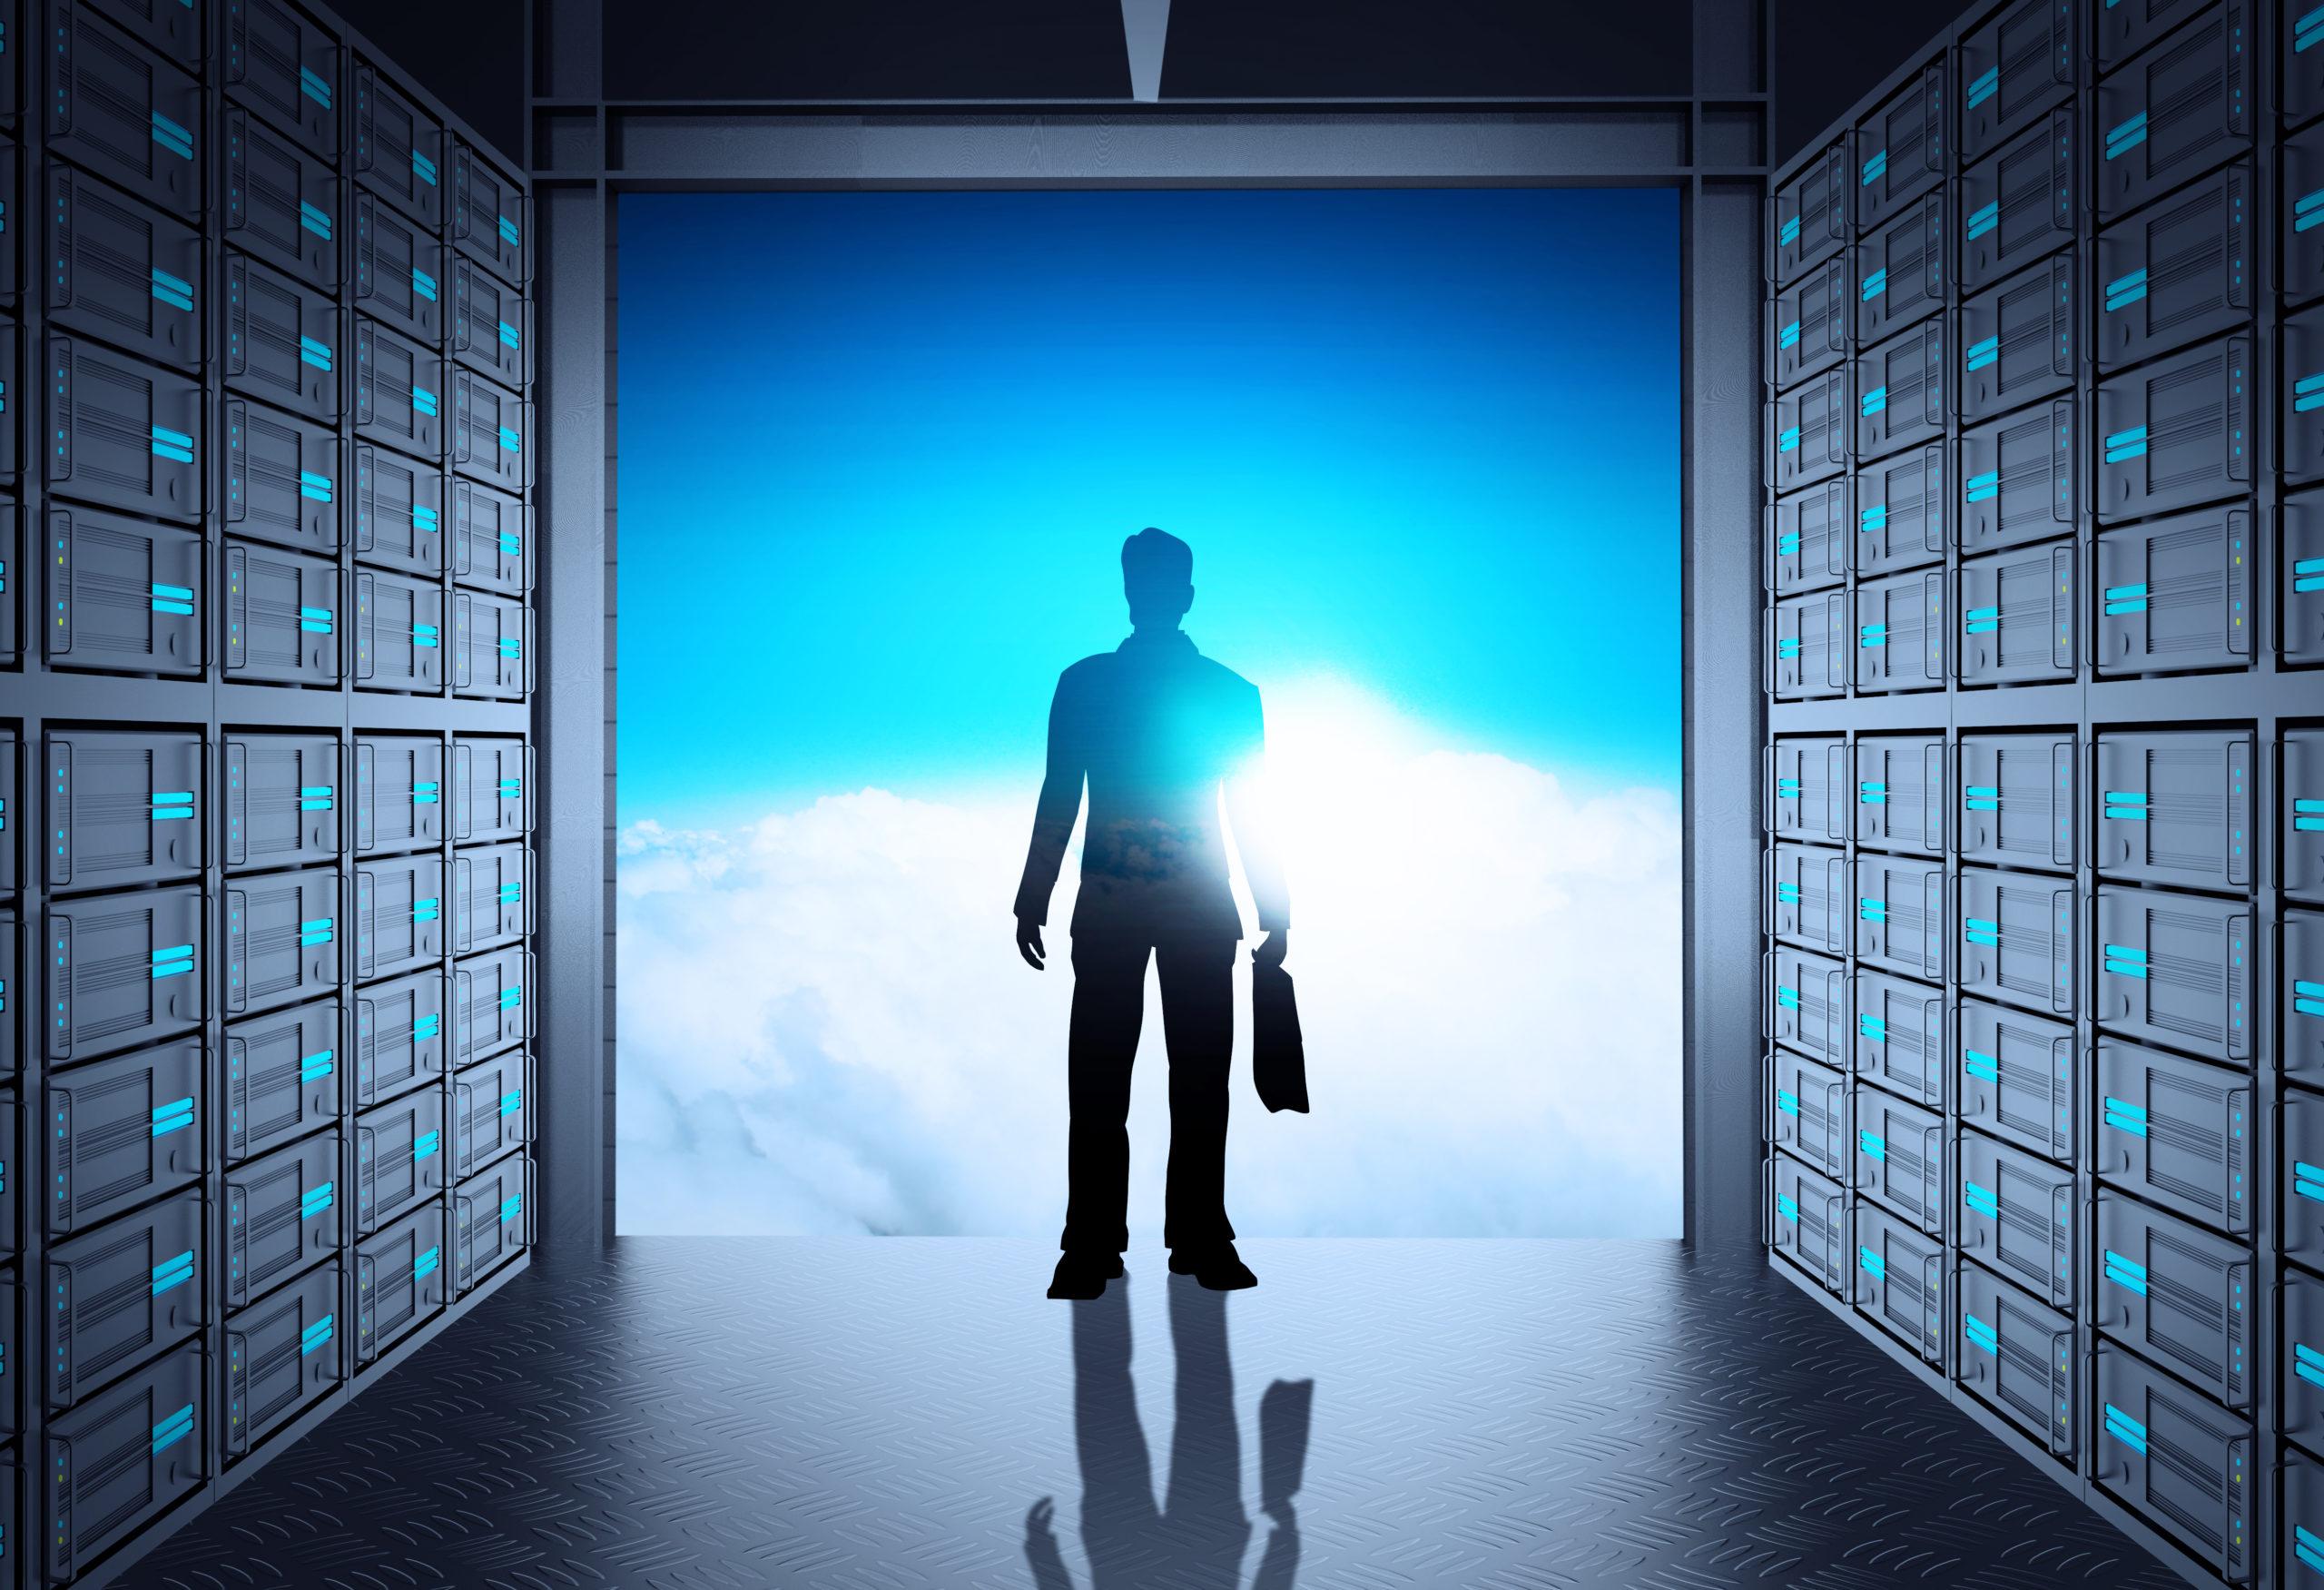 Ma ka Premise Data Center vs Cloud Data Center no kāu WMS